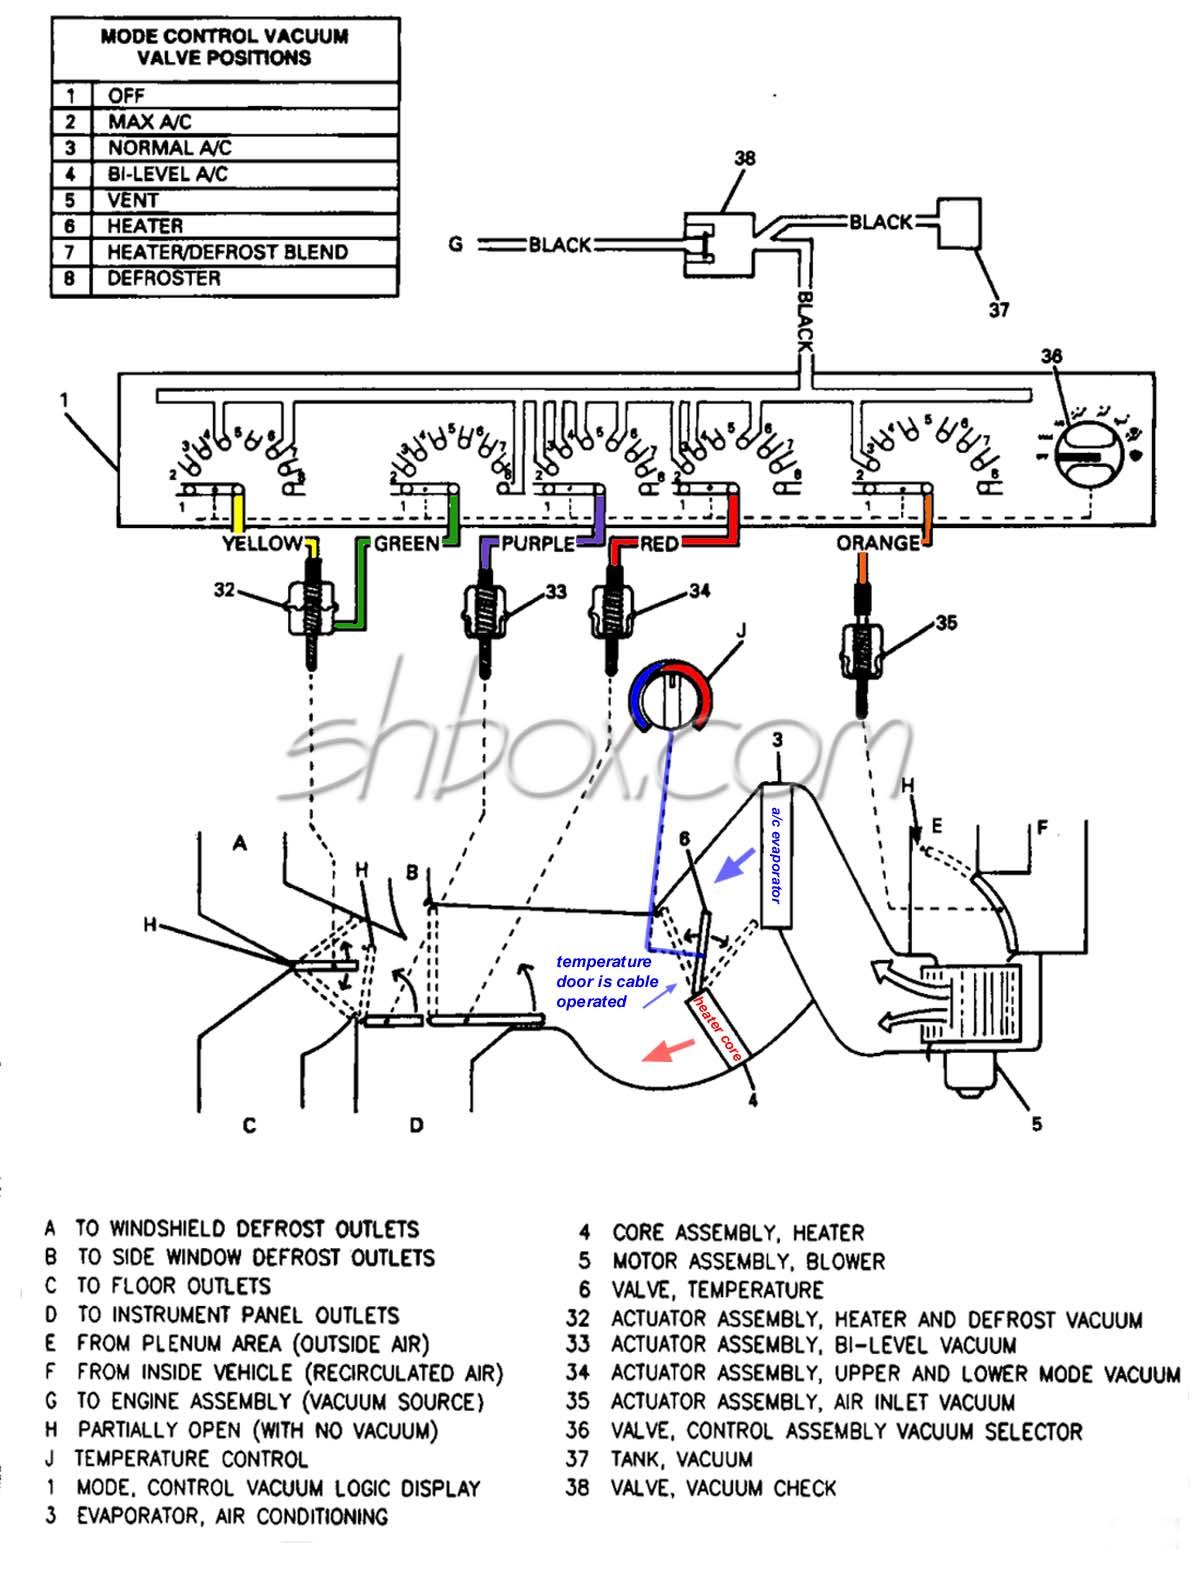 hight resolution of vacuum diagram 96 fleetwood